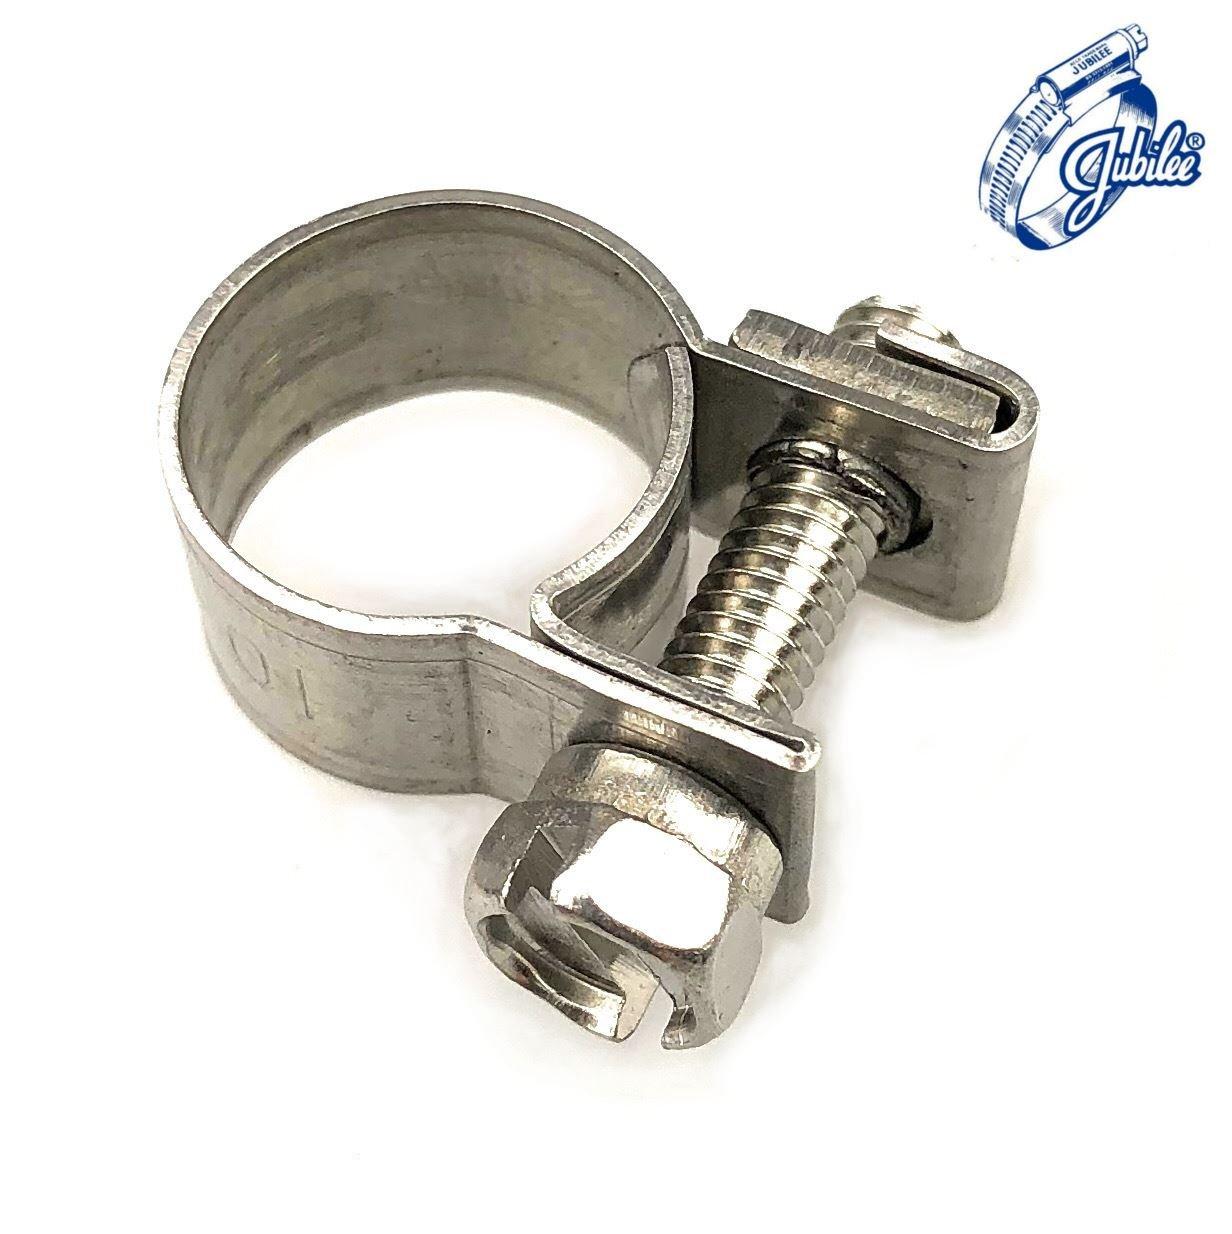 Jubilee Junior Clip 7-9mm Zinc Plated 2 clips